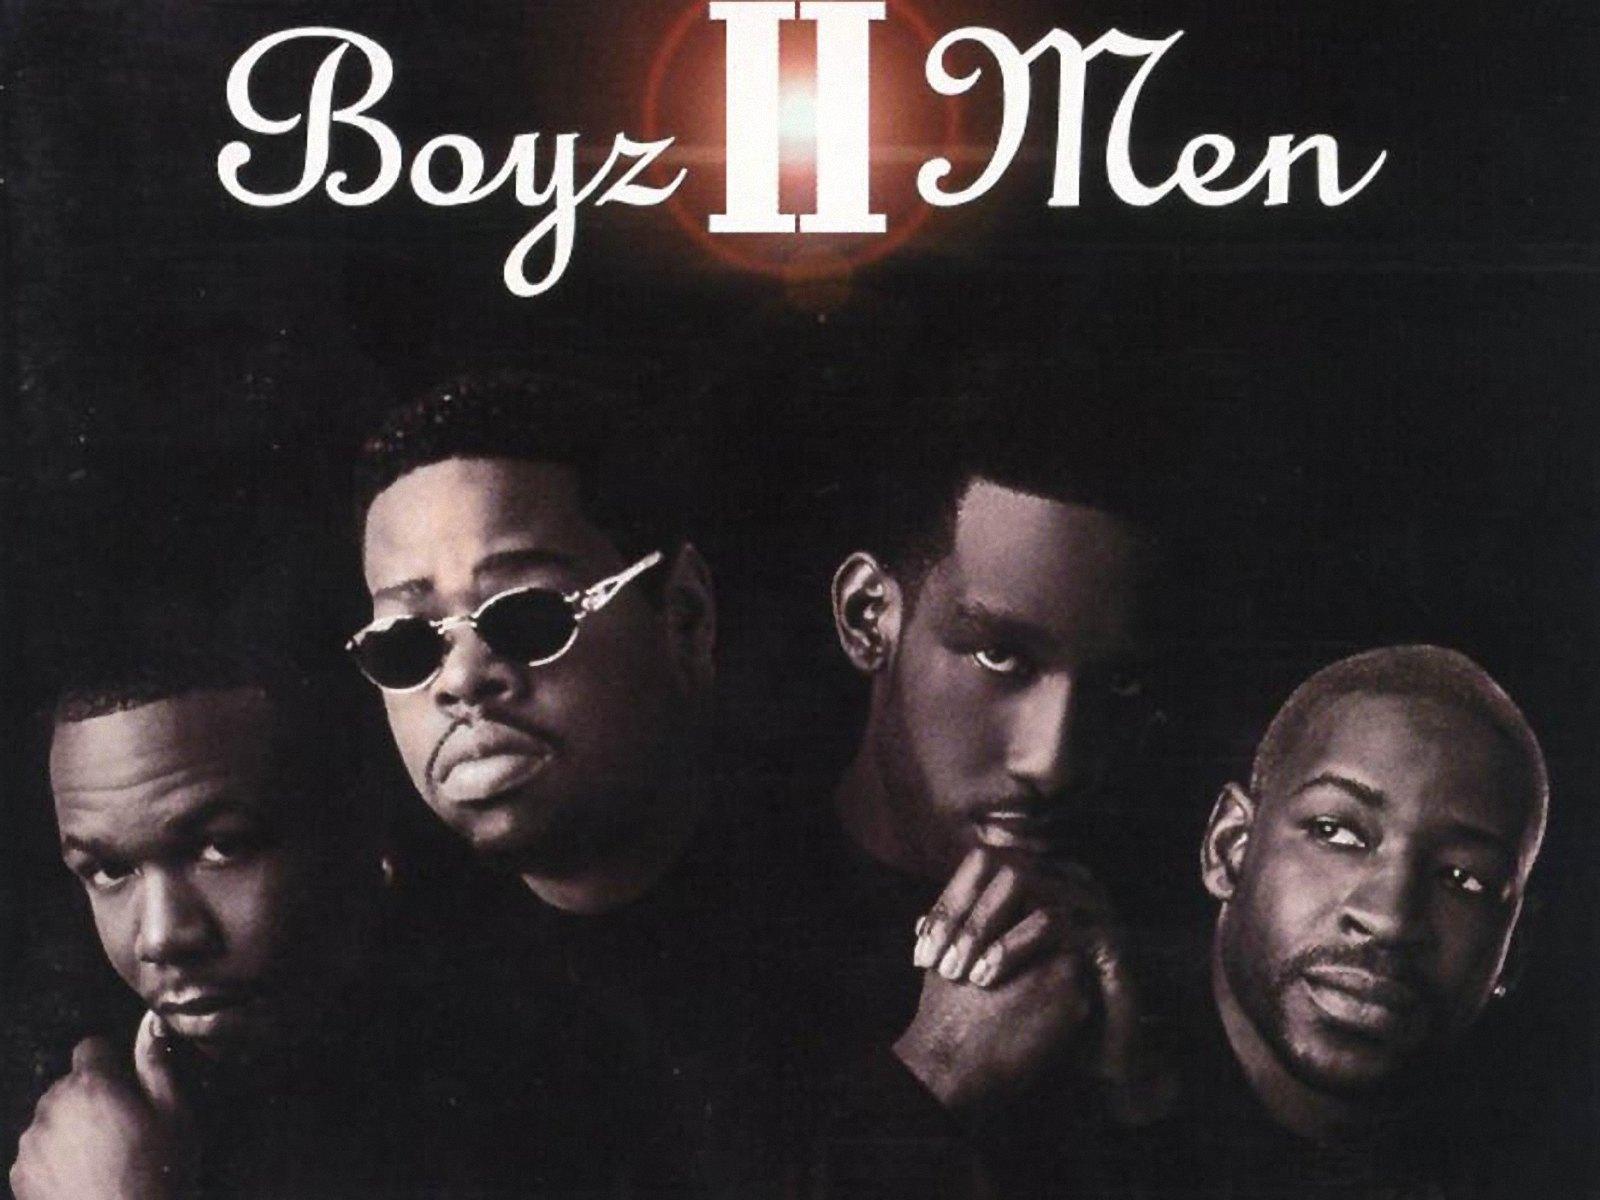 Best 54 Boyz Wallpaper on HipWallpaper Wonder Boyz Wallpaper 1600x1200